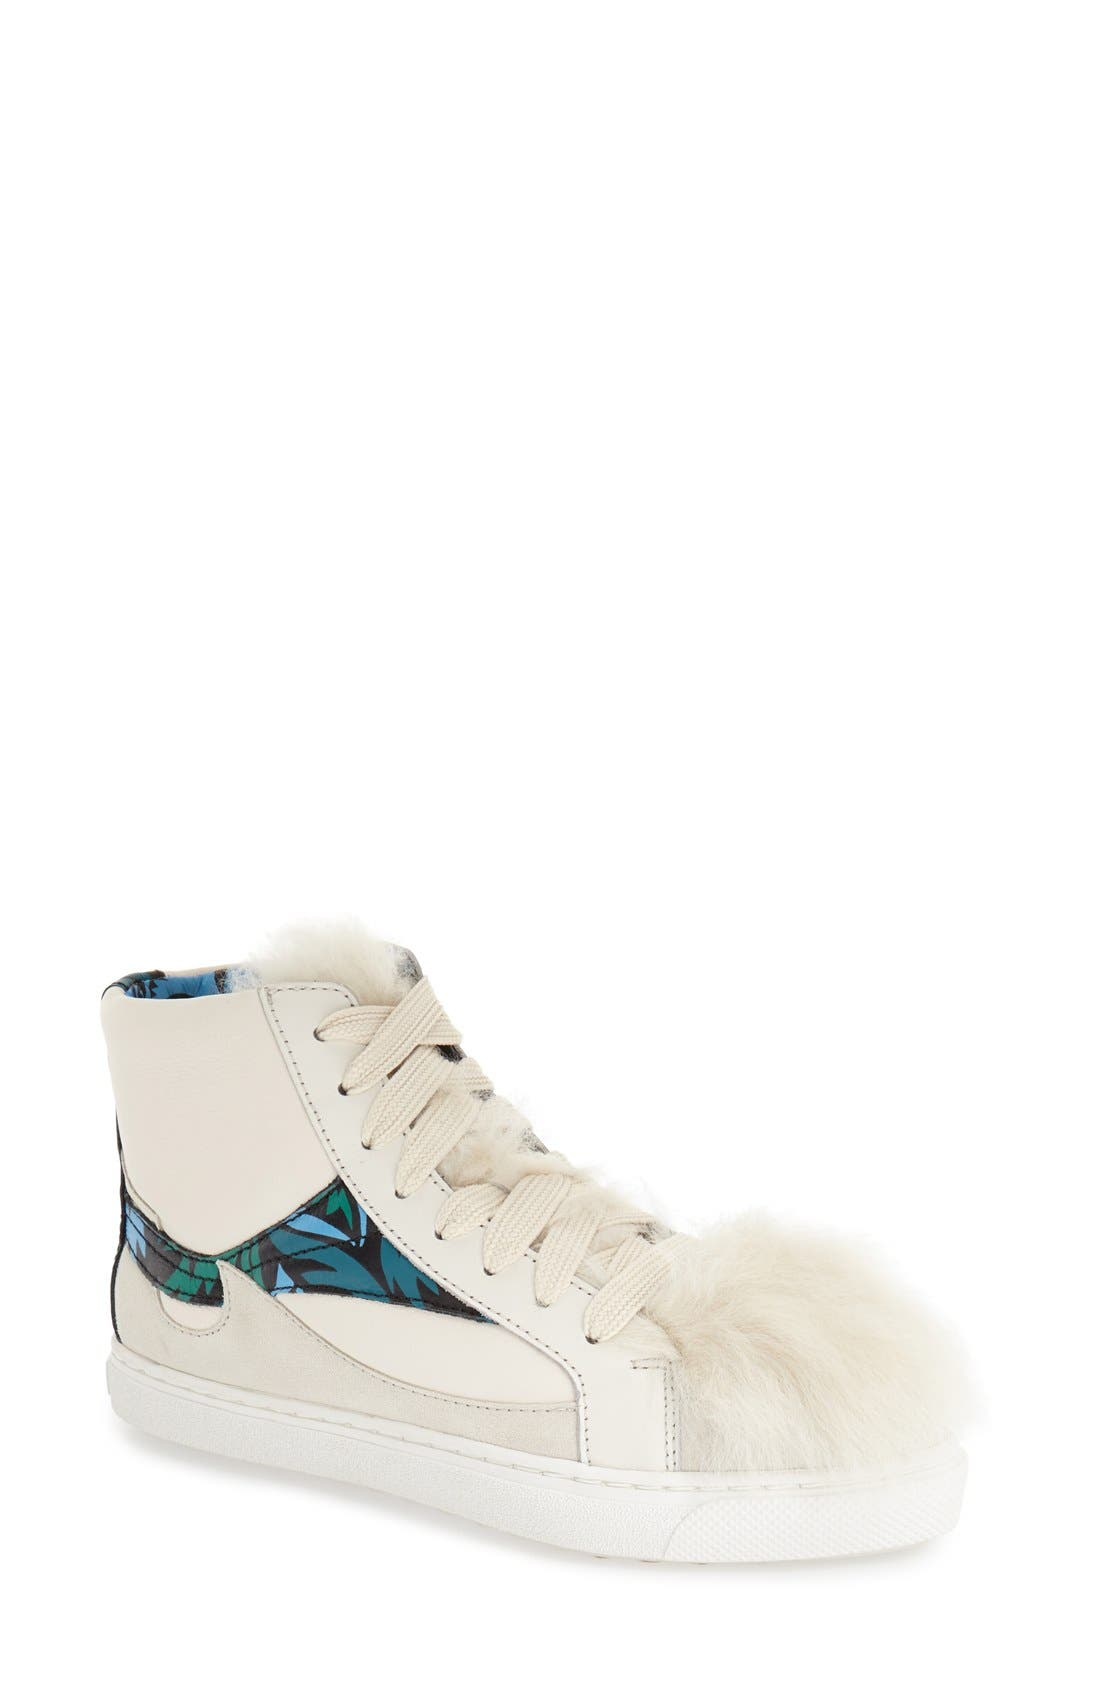 COACH, Genuine Shearling High Top Sneaker, Main thumbnail 1, color, 188